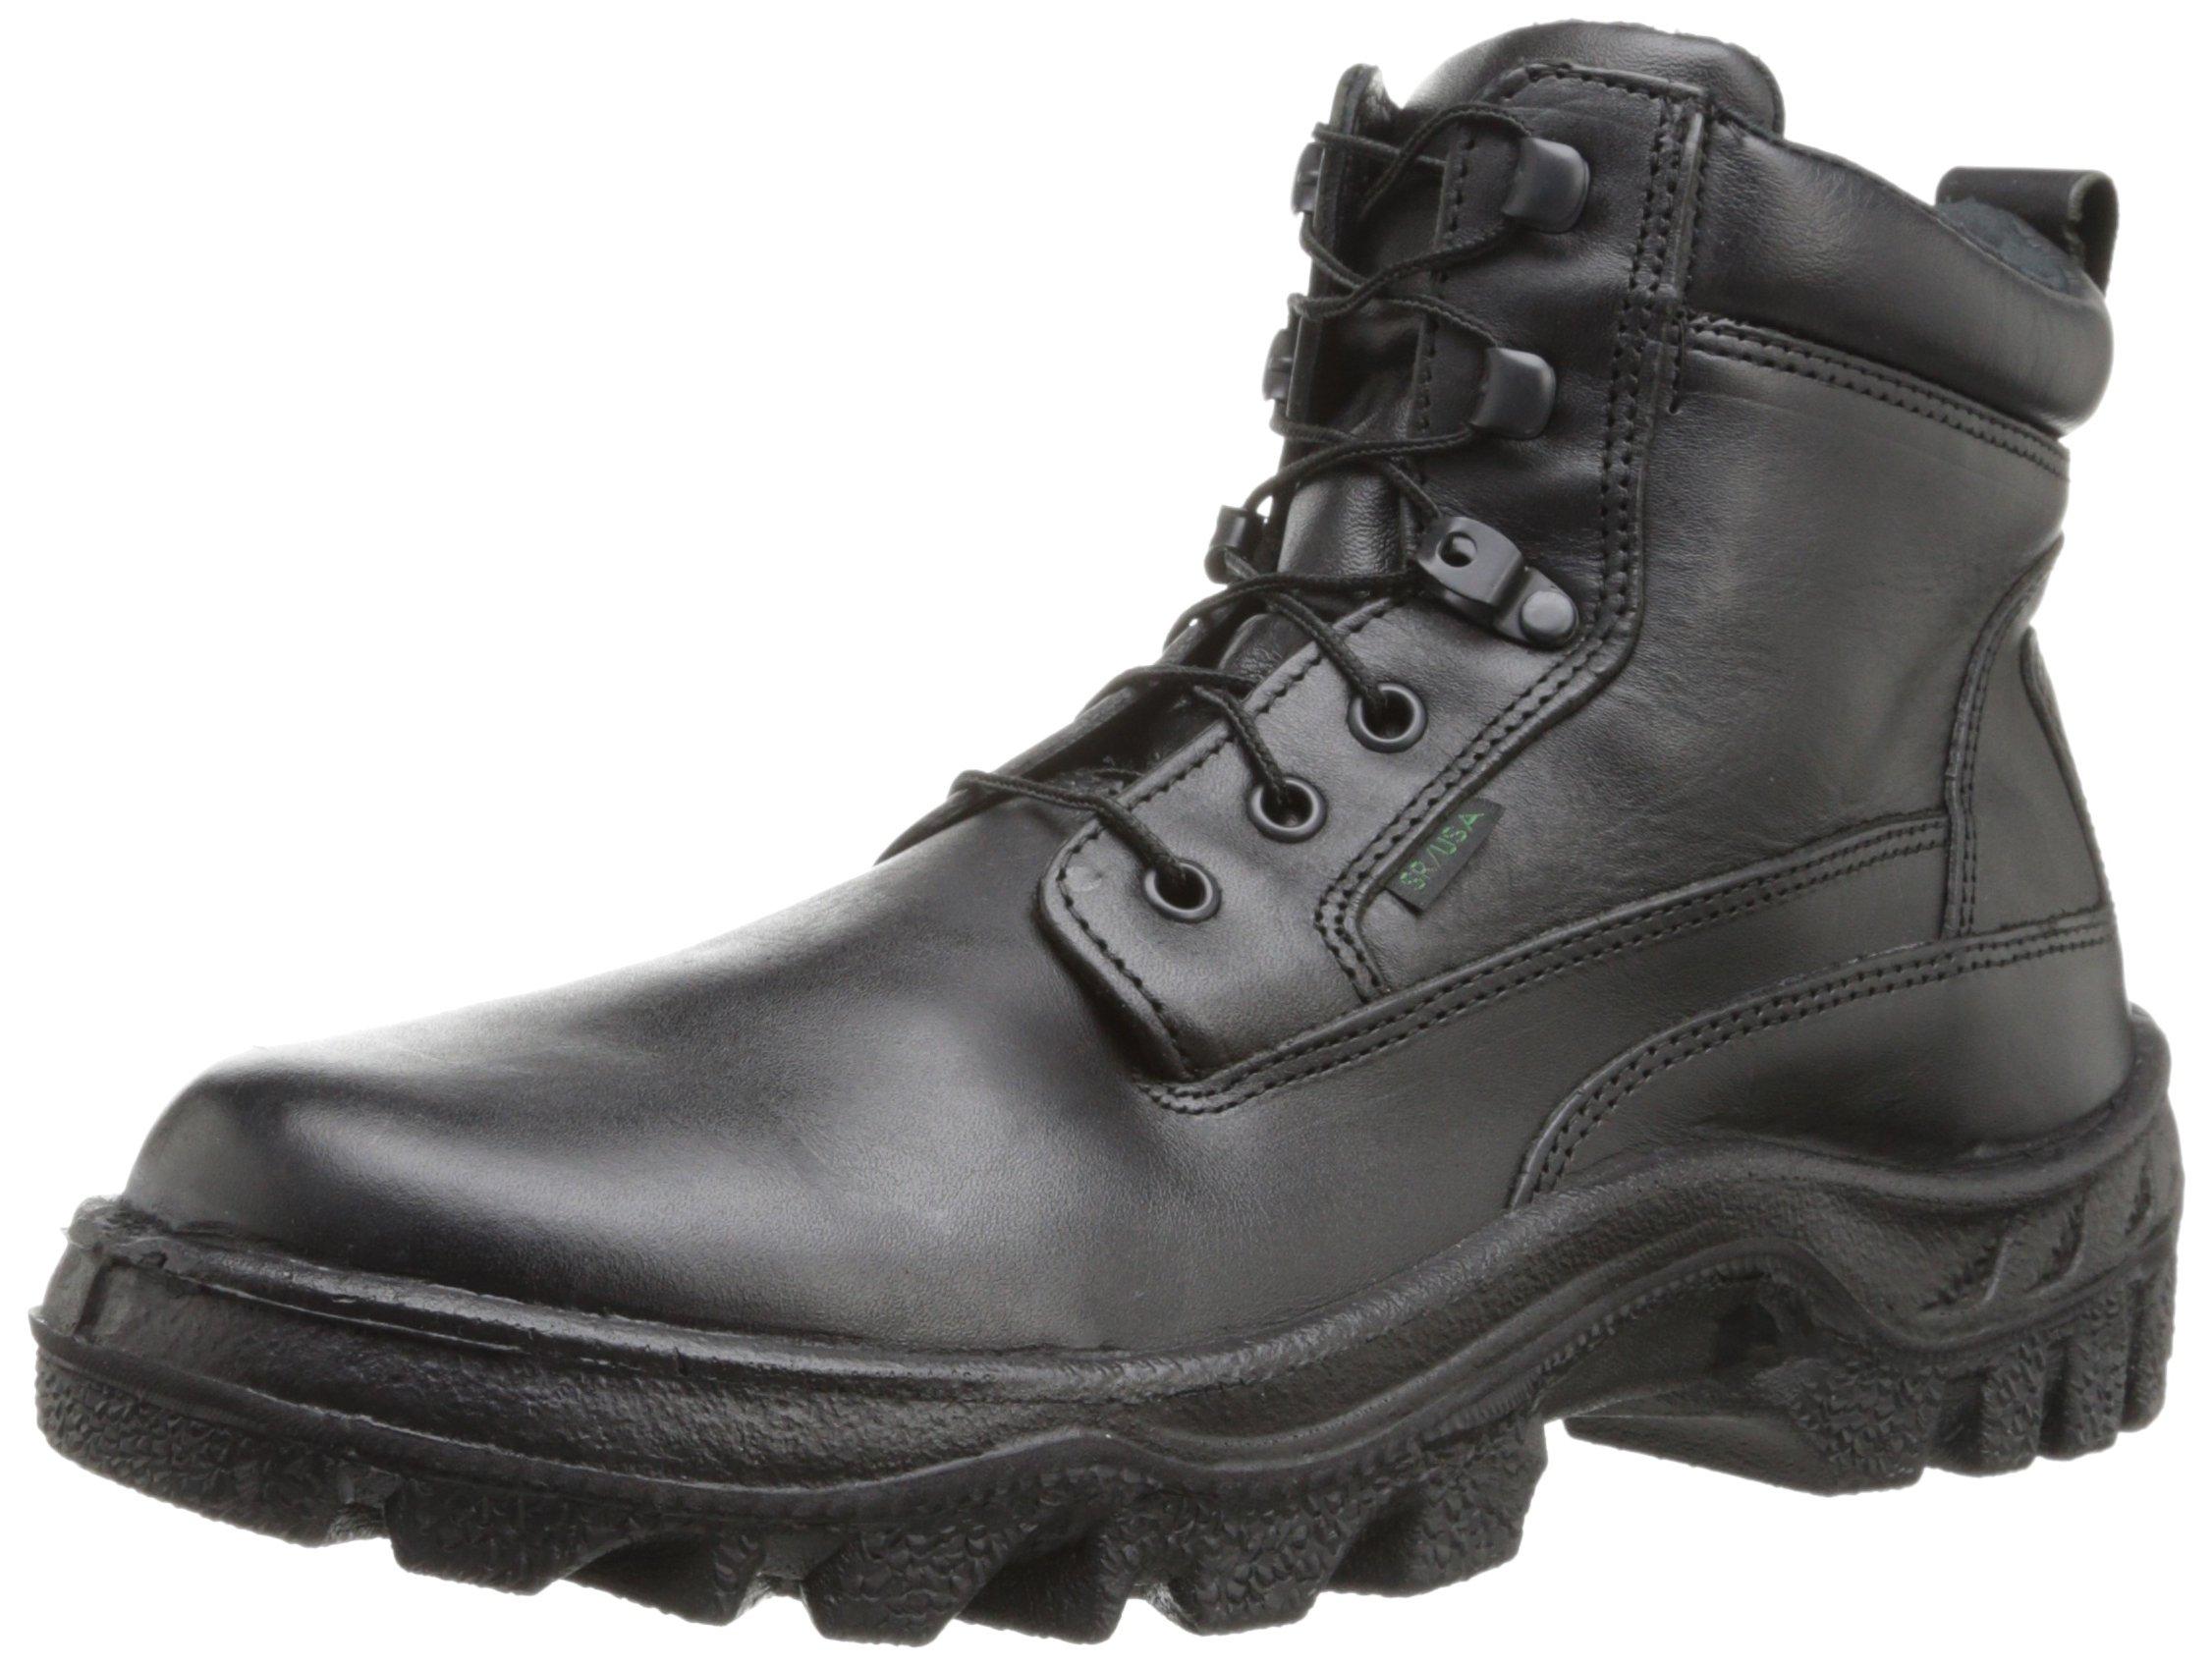 Rocky Men's Postal TMC 6 Inch Plain Toe Work Boot,Black,9 M US